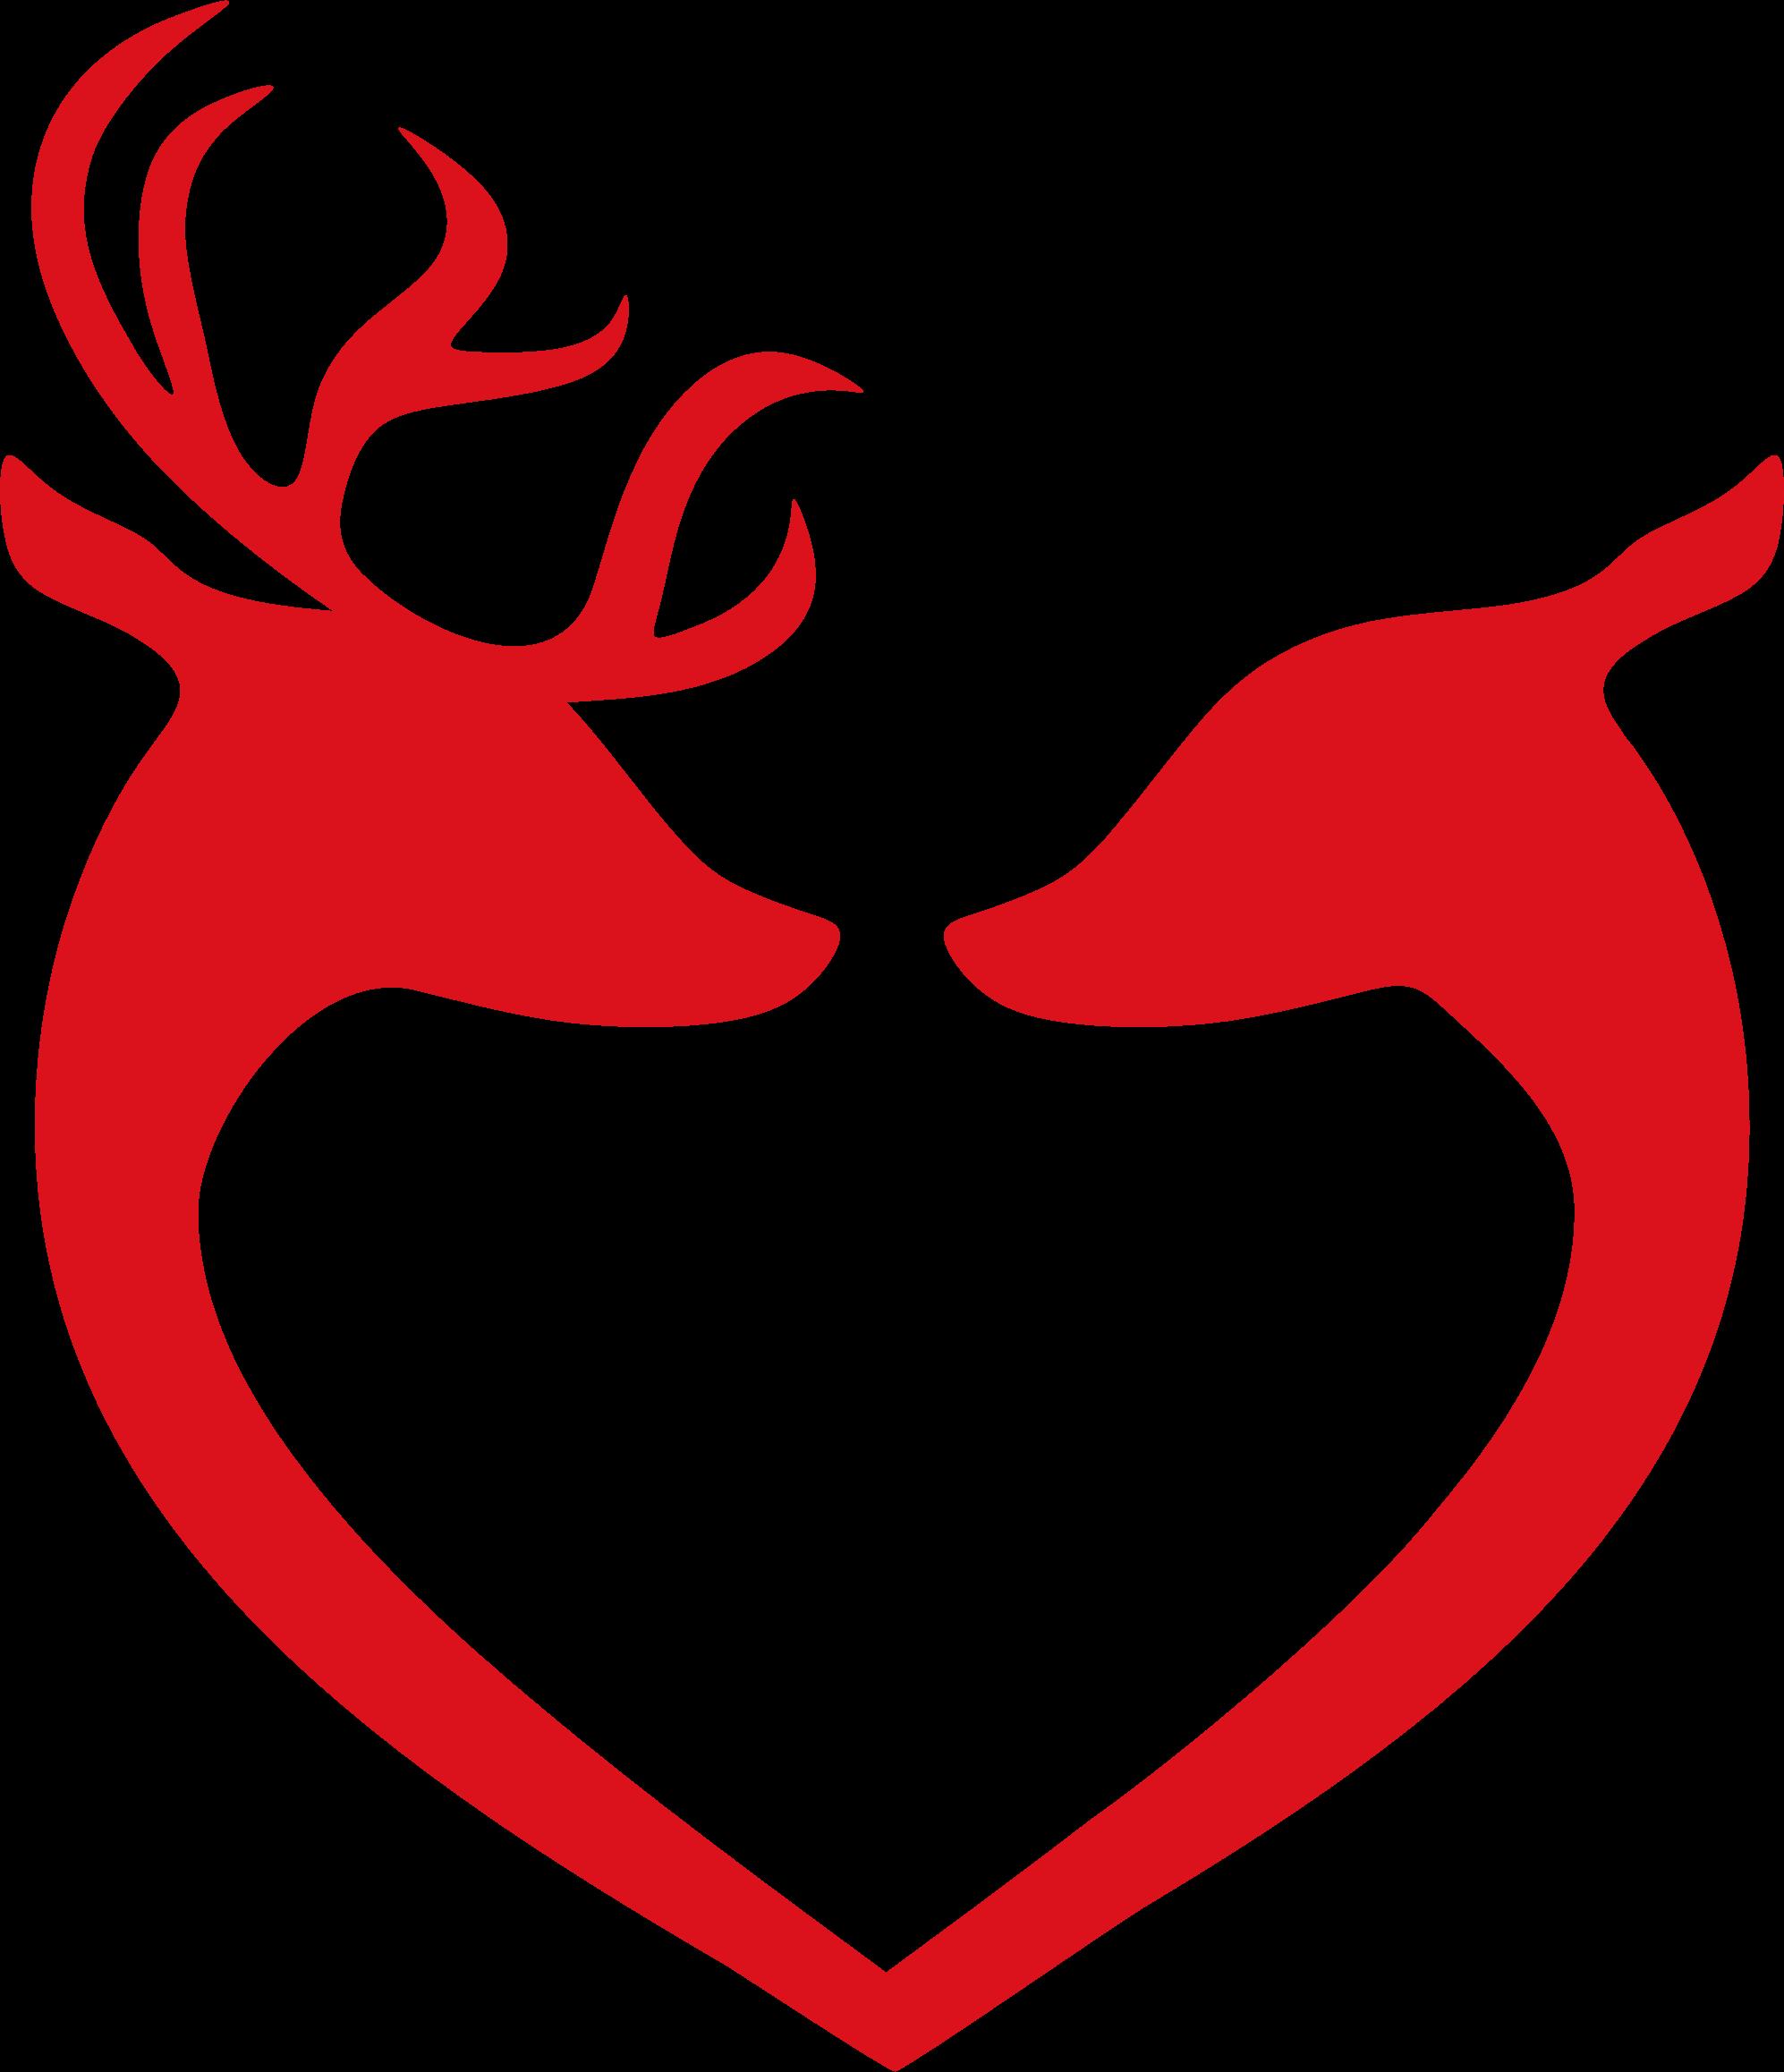 K.o.p.e.l. clipart heart Clipart Silhouette Couple Silhouette Deer